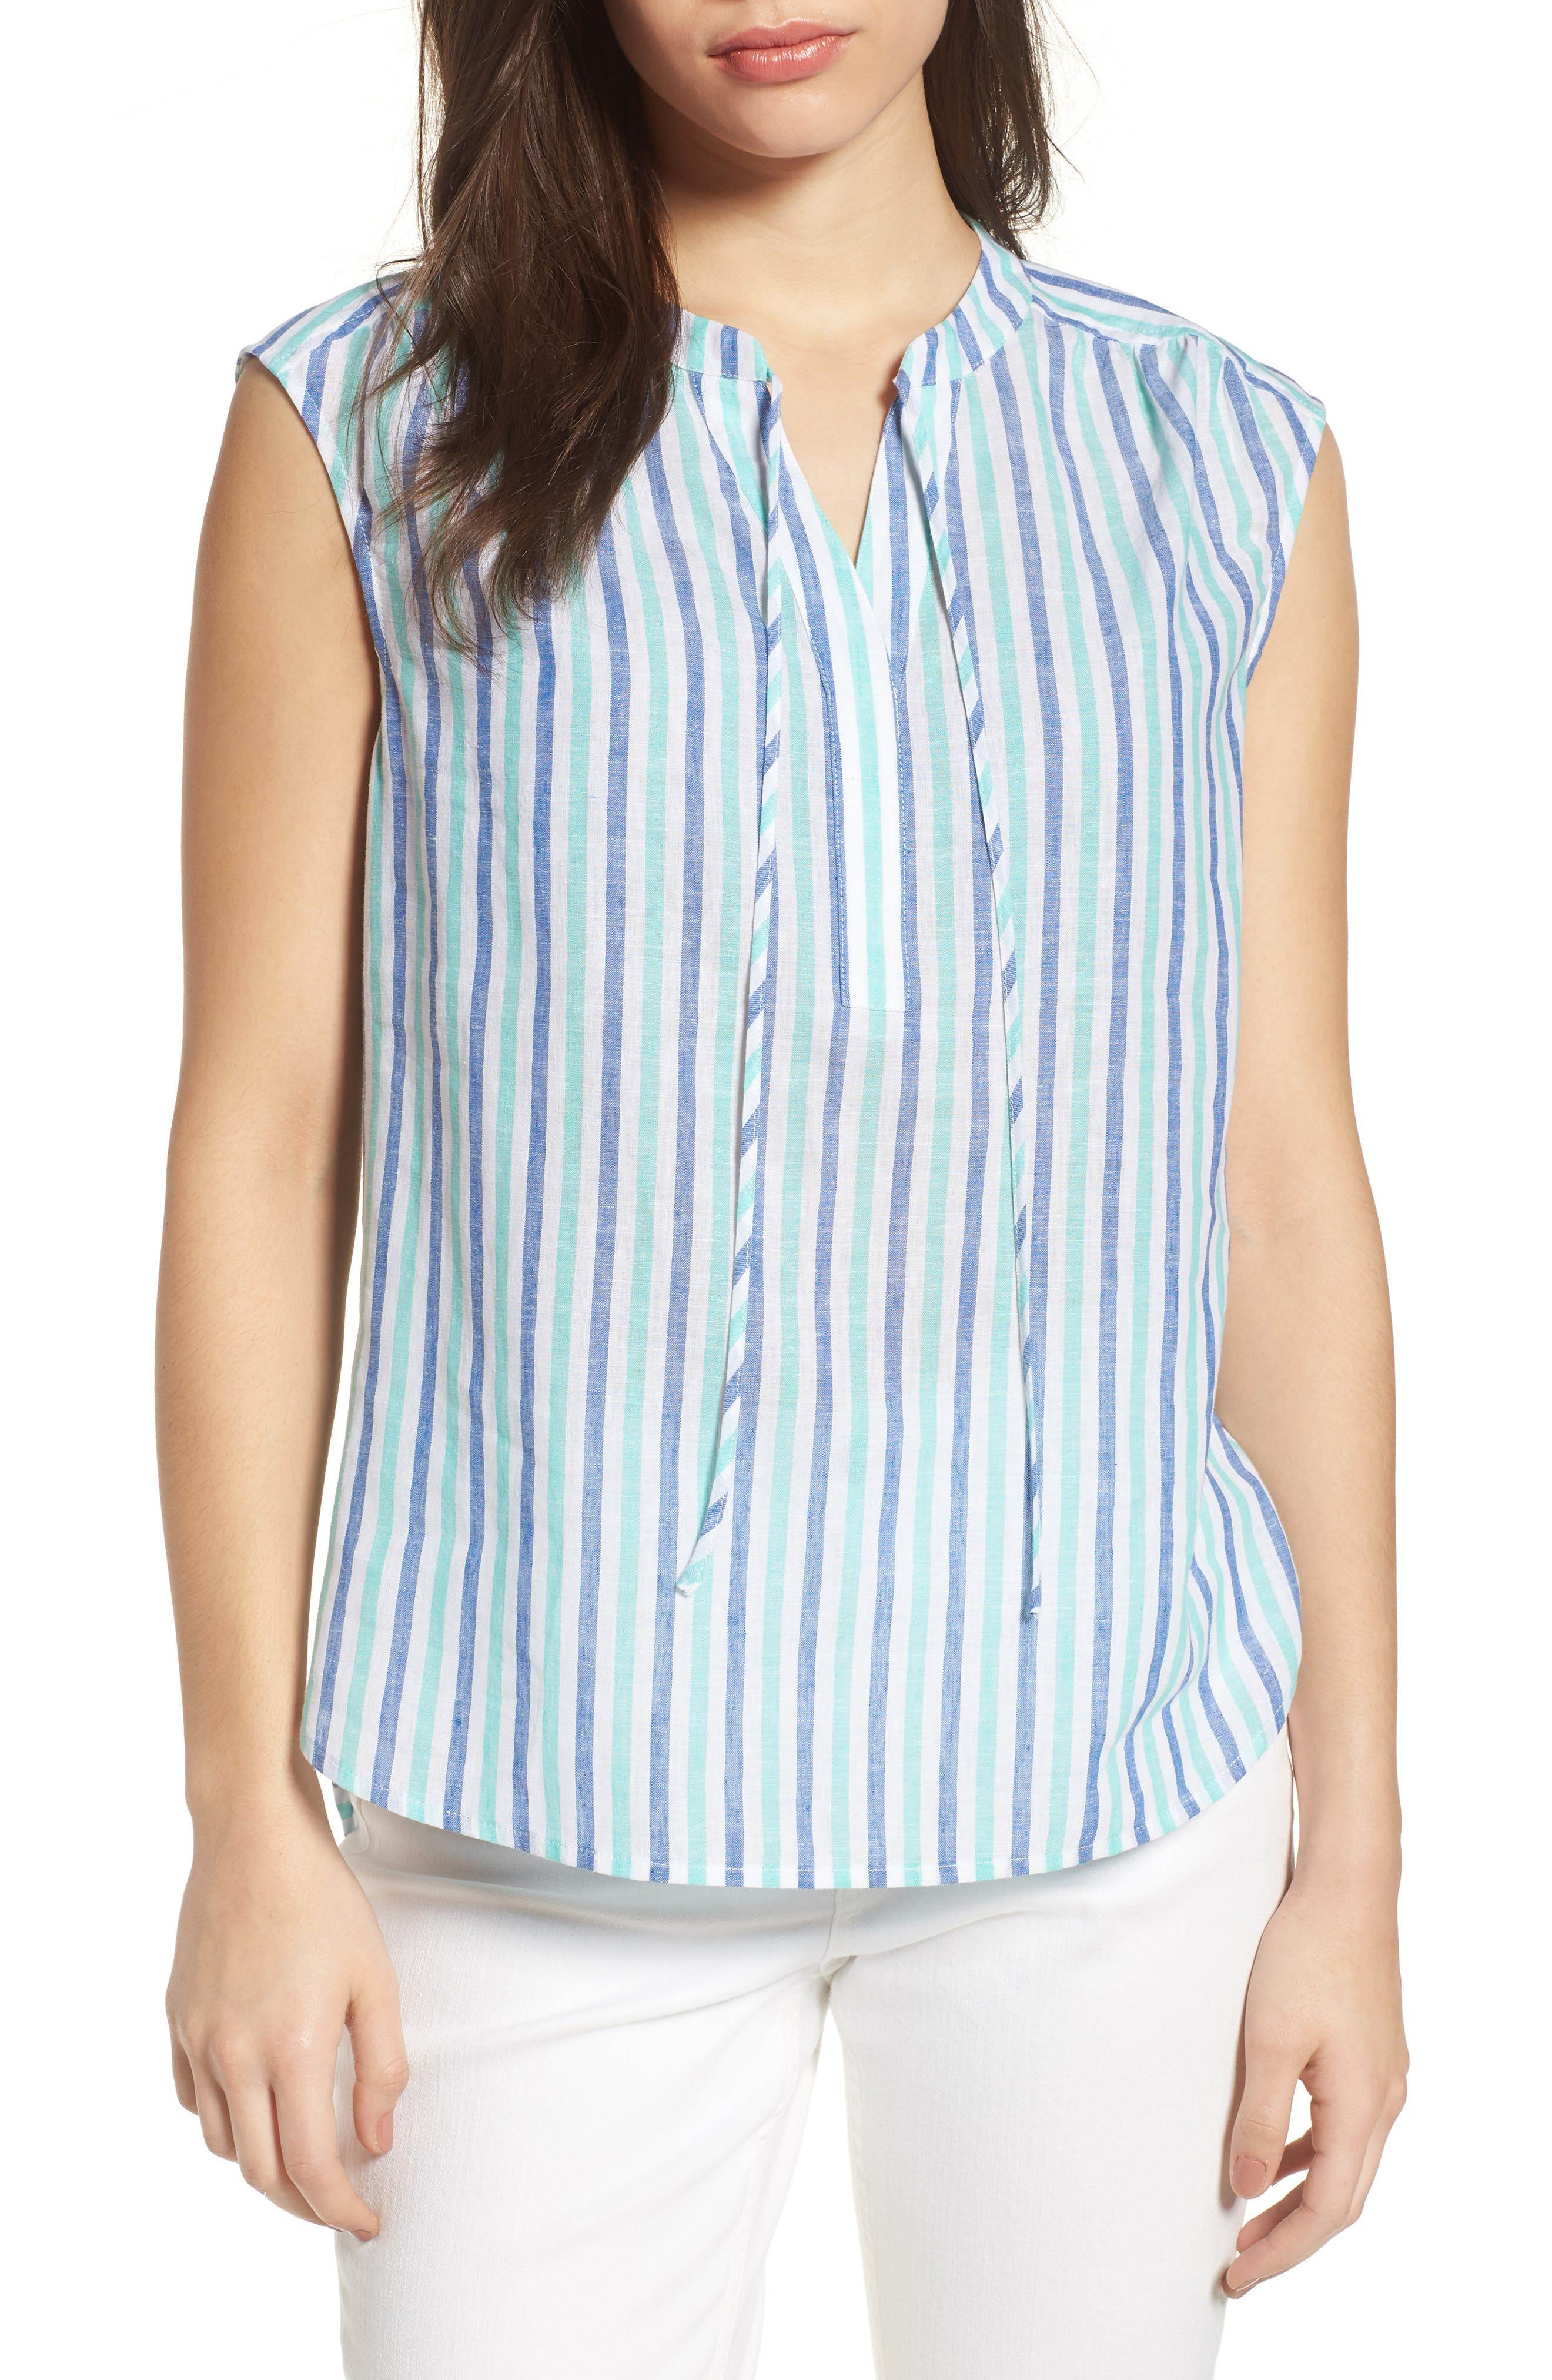 Hope Bay Linen Cotton Stripe Top,                             Main thumbnail 1, color,                             Capri Blue